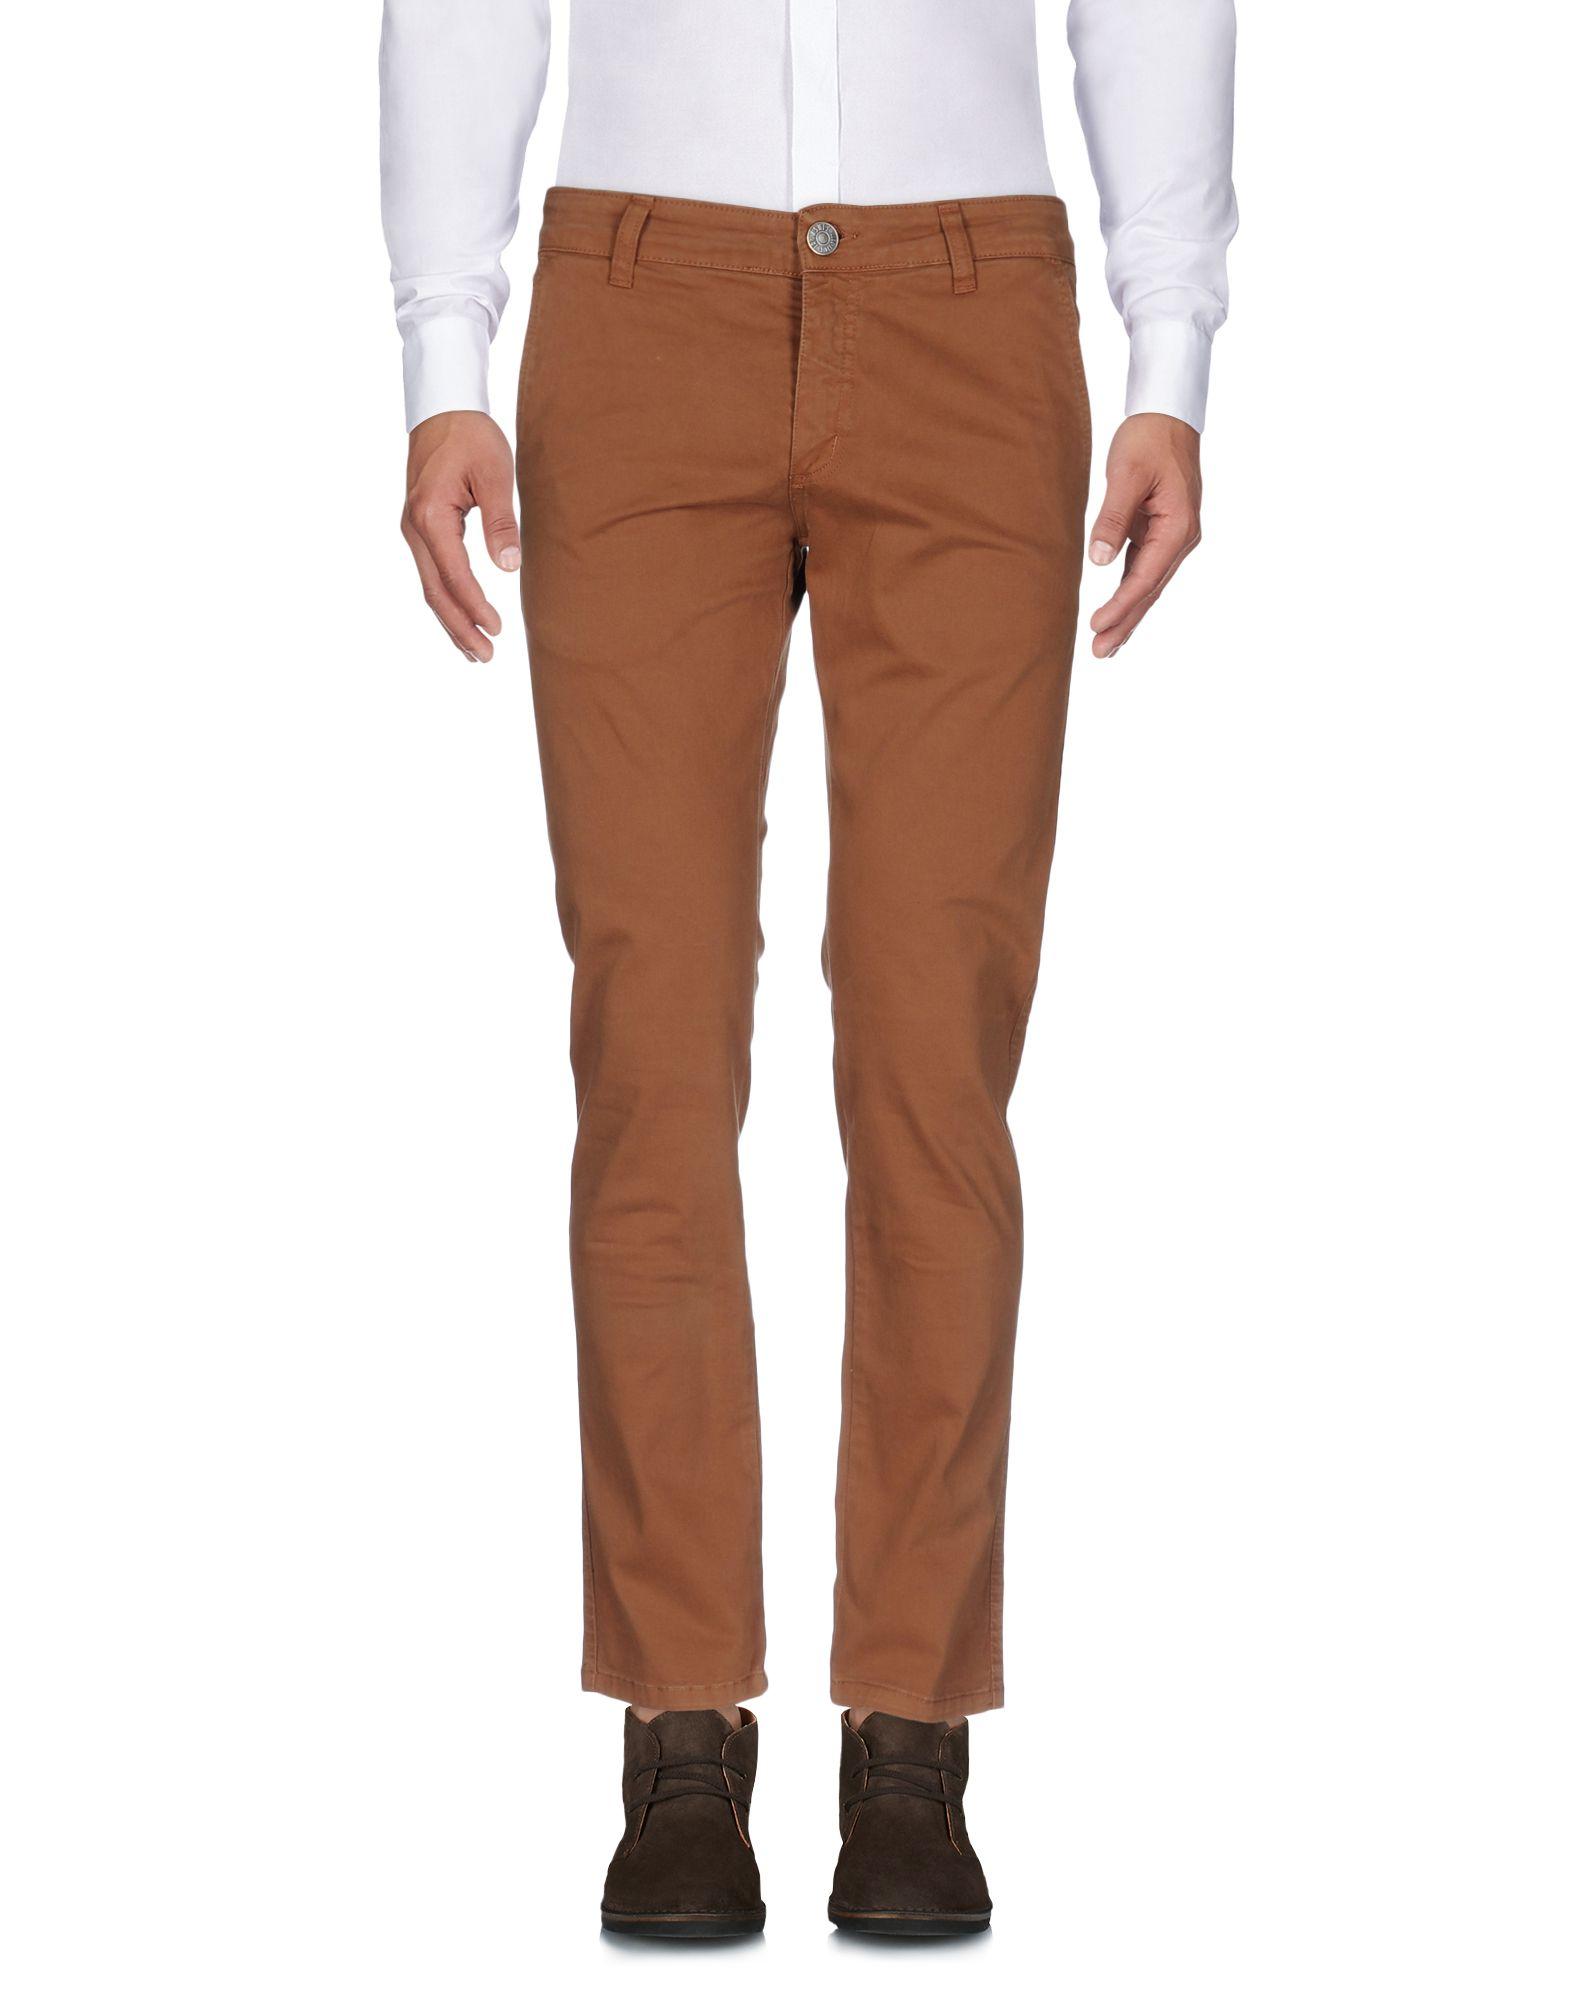 IAN ASHES HOMME Повседневные брюки cylion 36